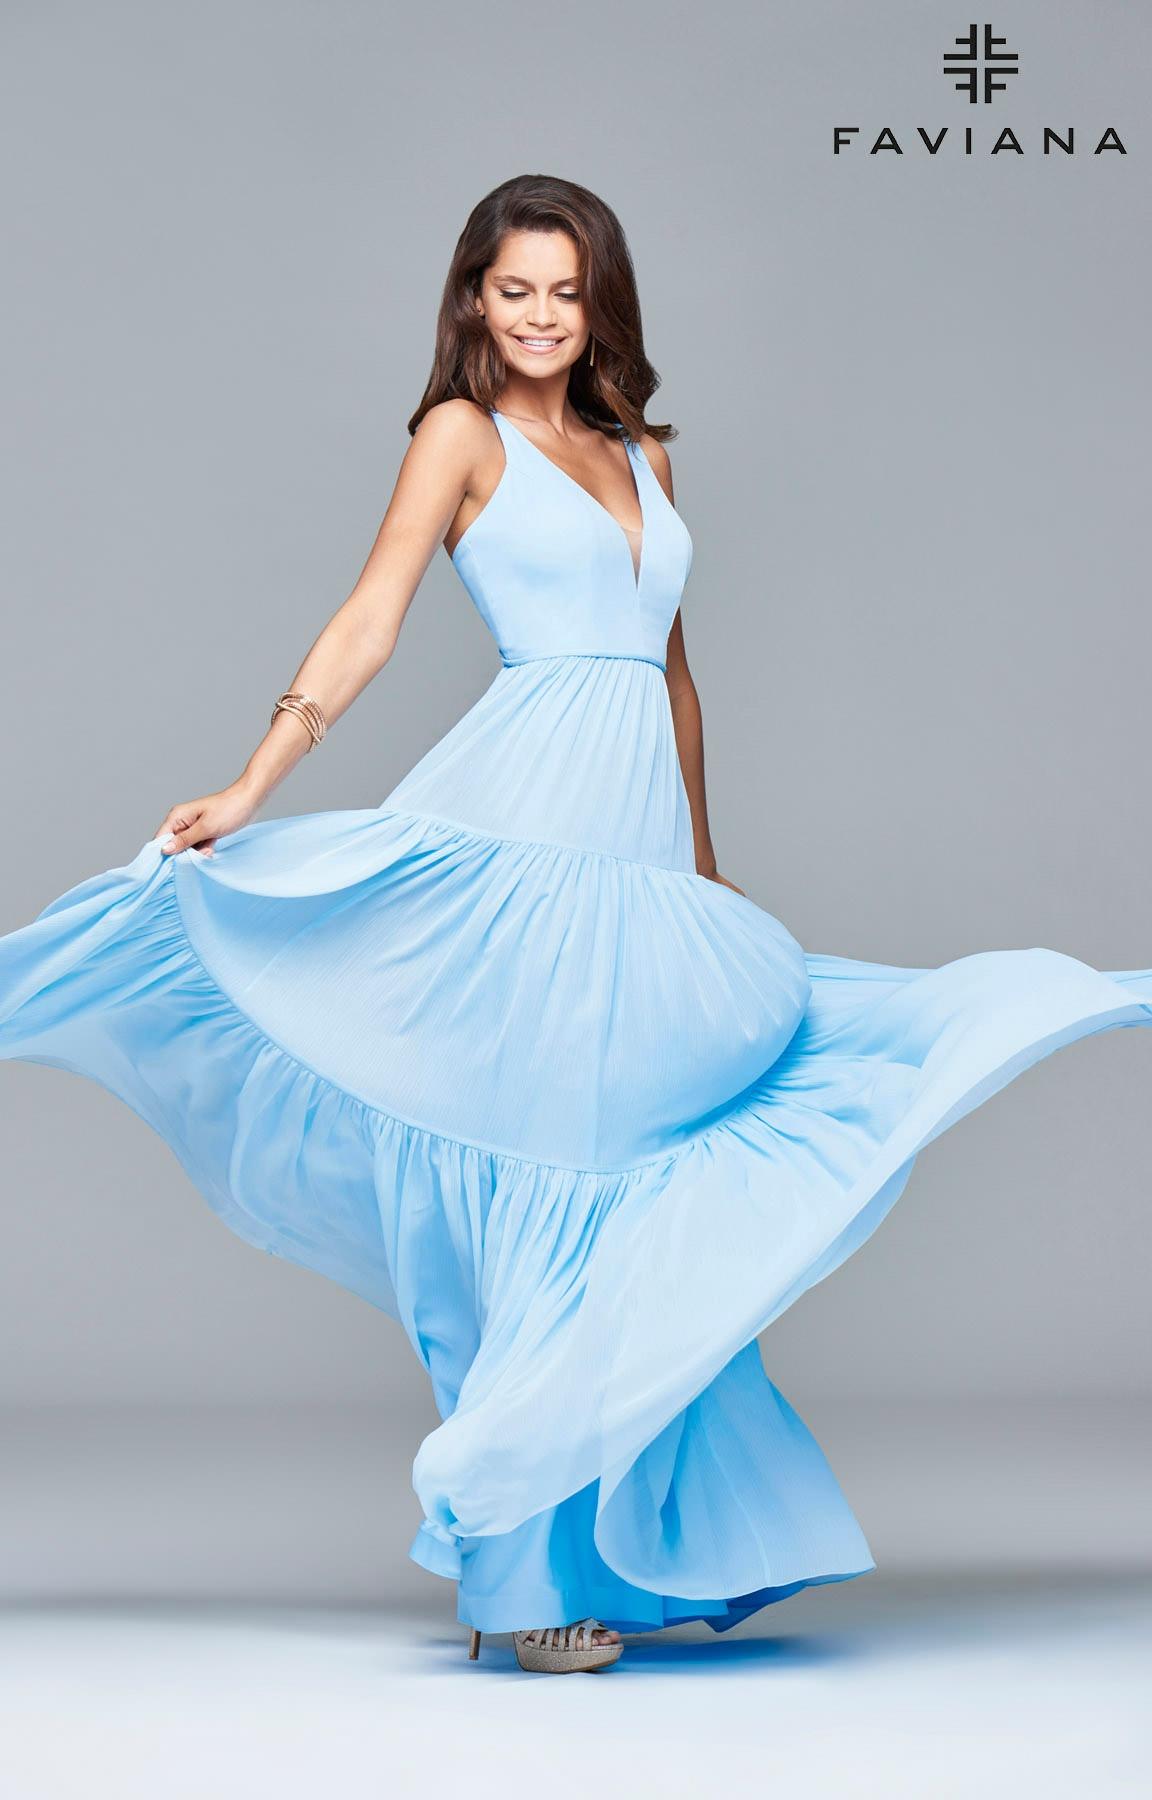 Faviana 7923 Beach Vibes Long Dress Prom Dress